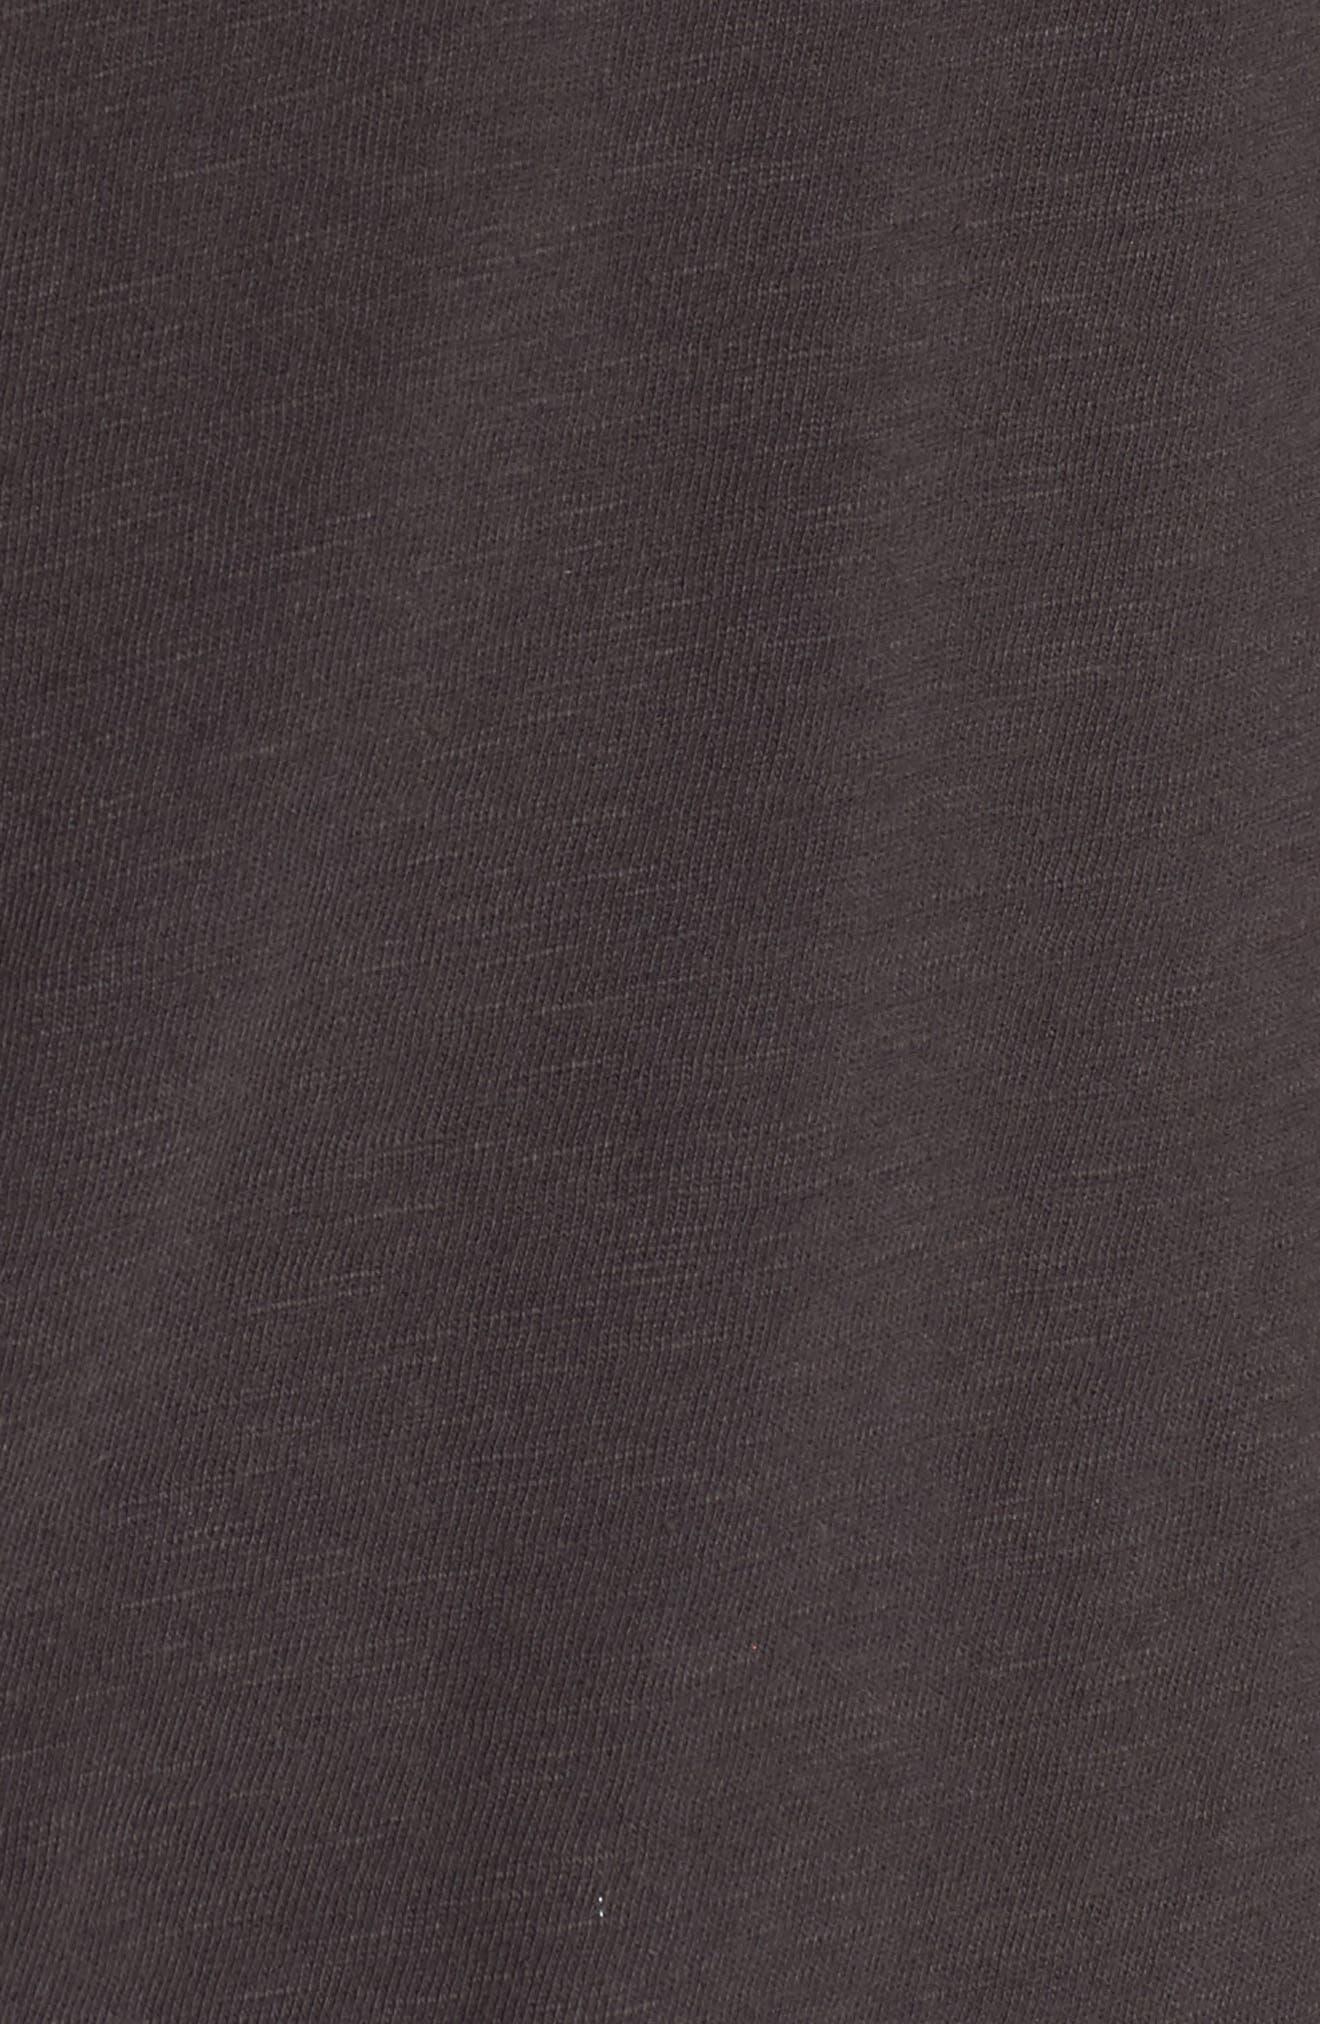 Ruffle Slub Knit Tee,                             Alternate thumbnail 5, color,                             Coal